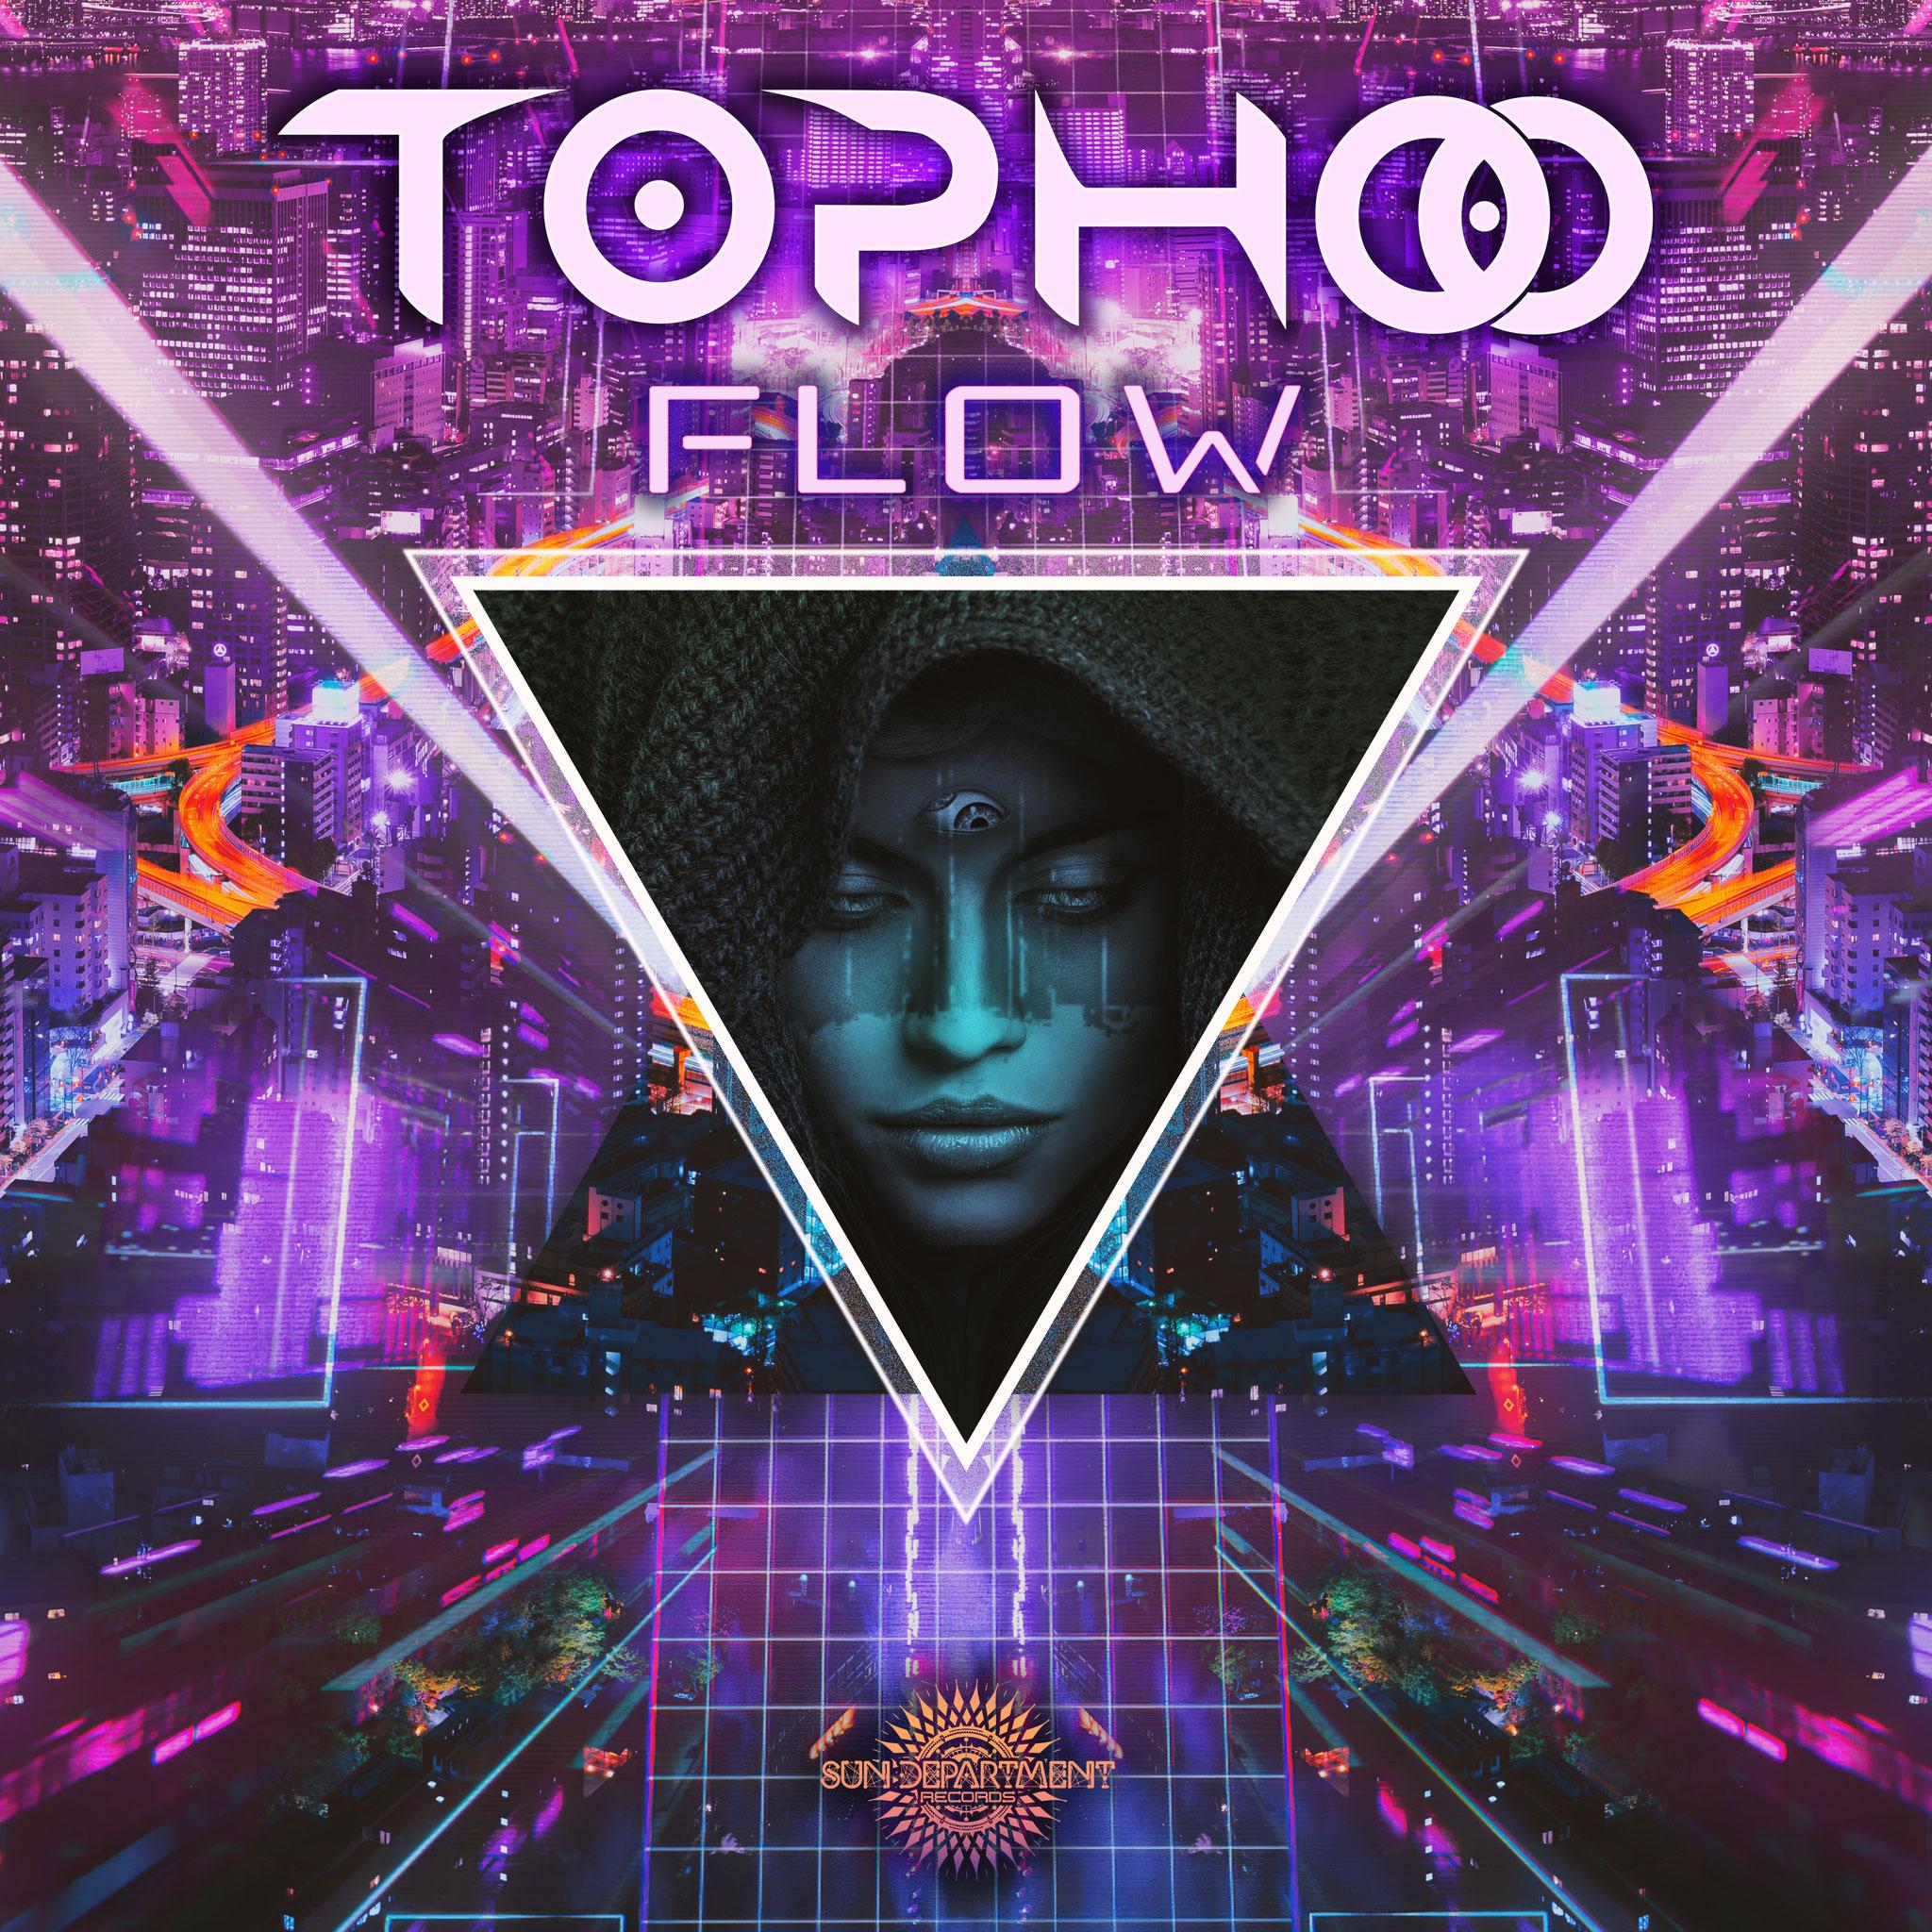 Tophoo - Flow